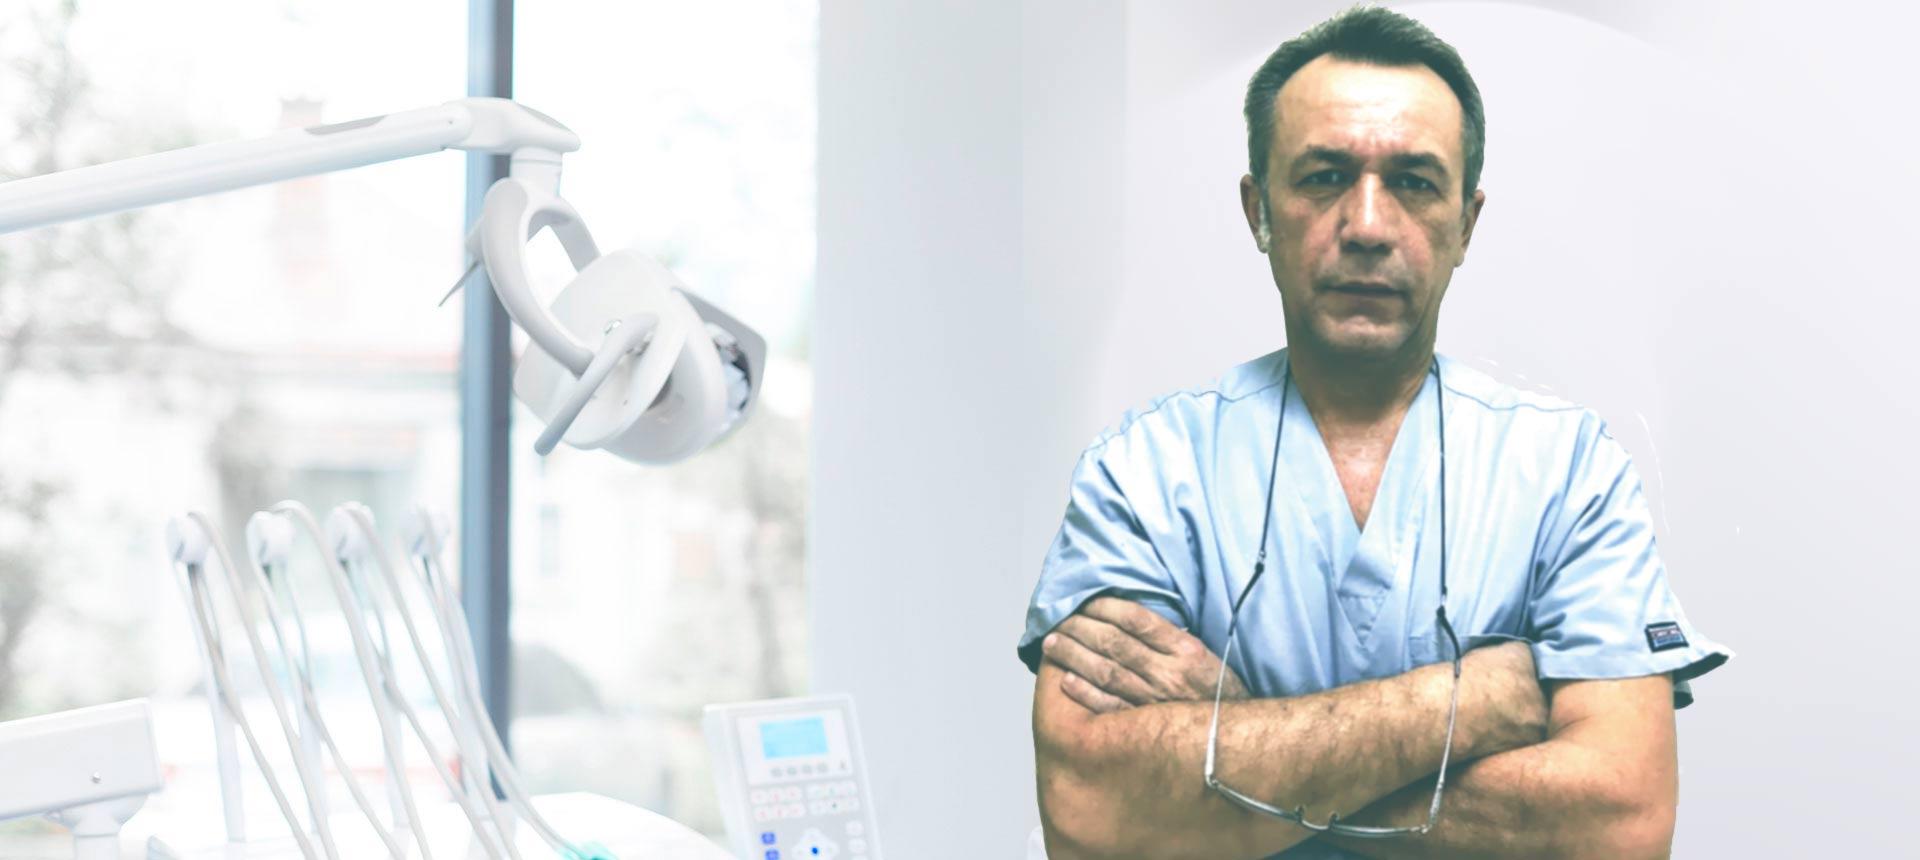 Хабиев Рустам стоматология москва